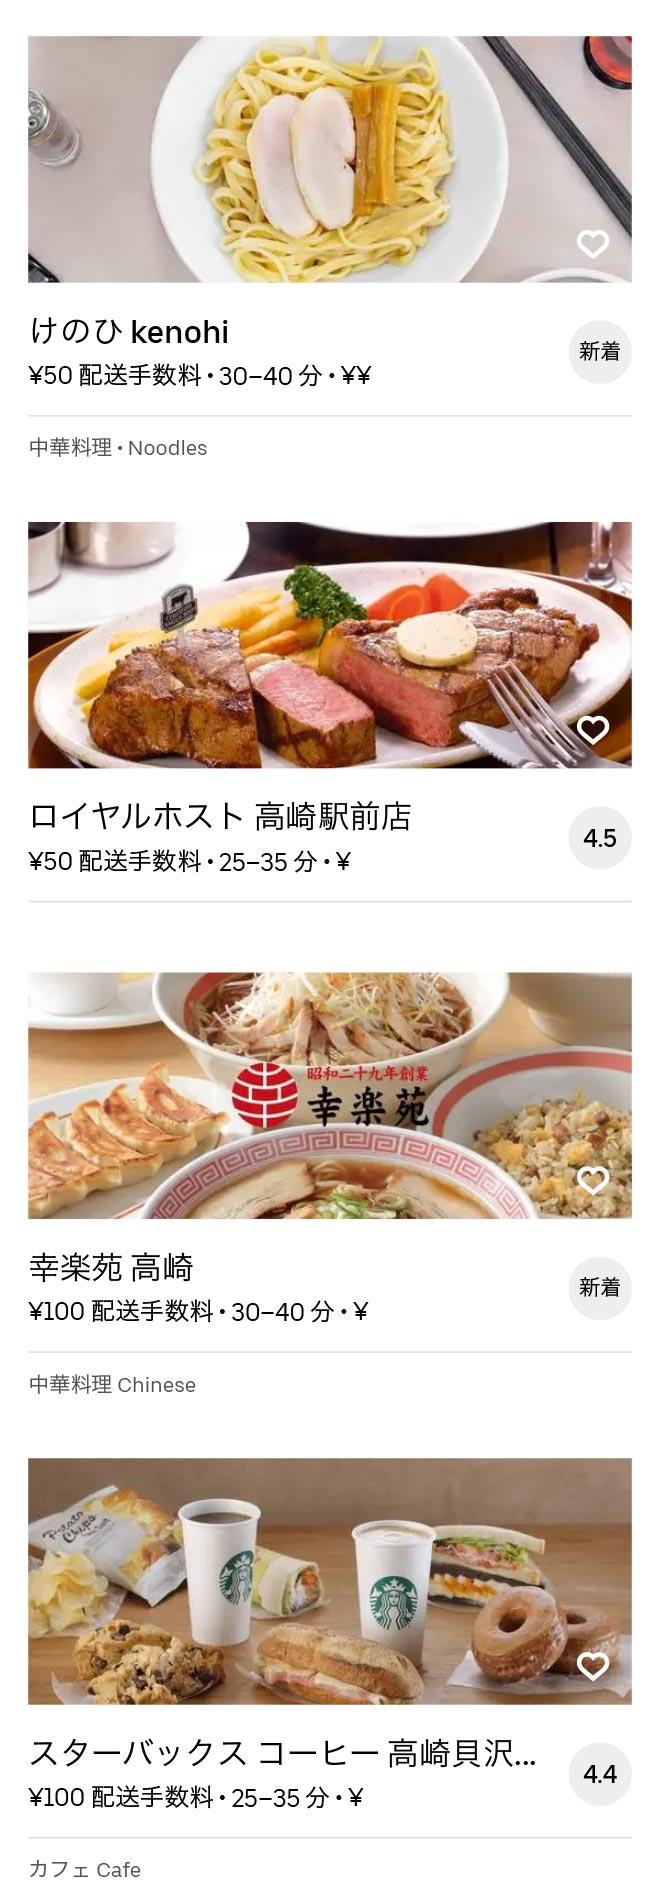 Tonyamachi menu 2010 09